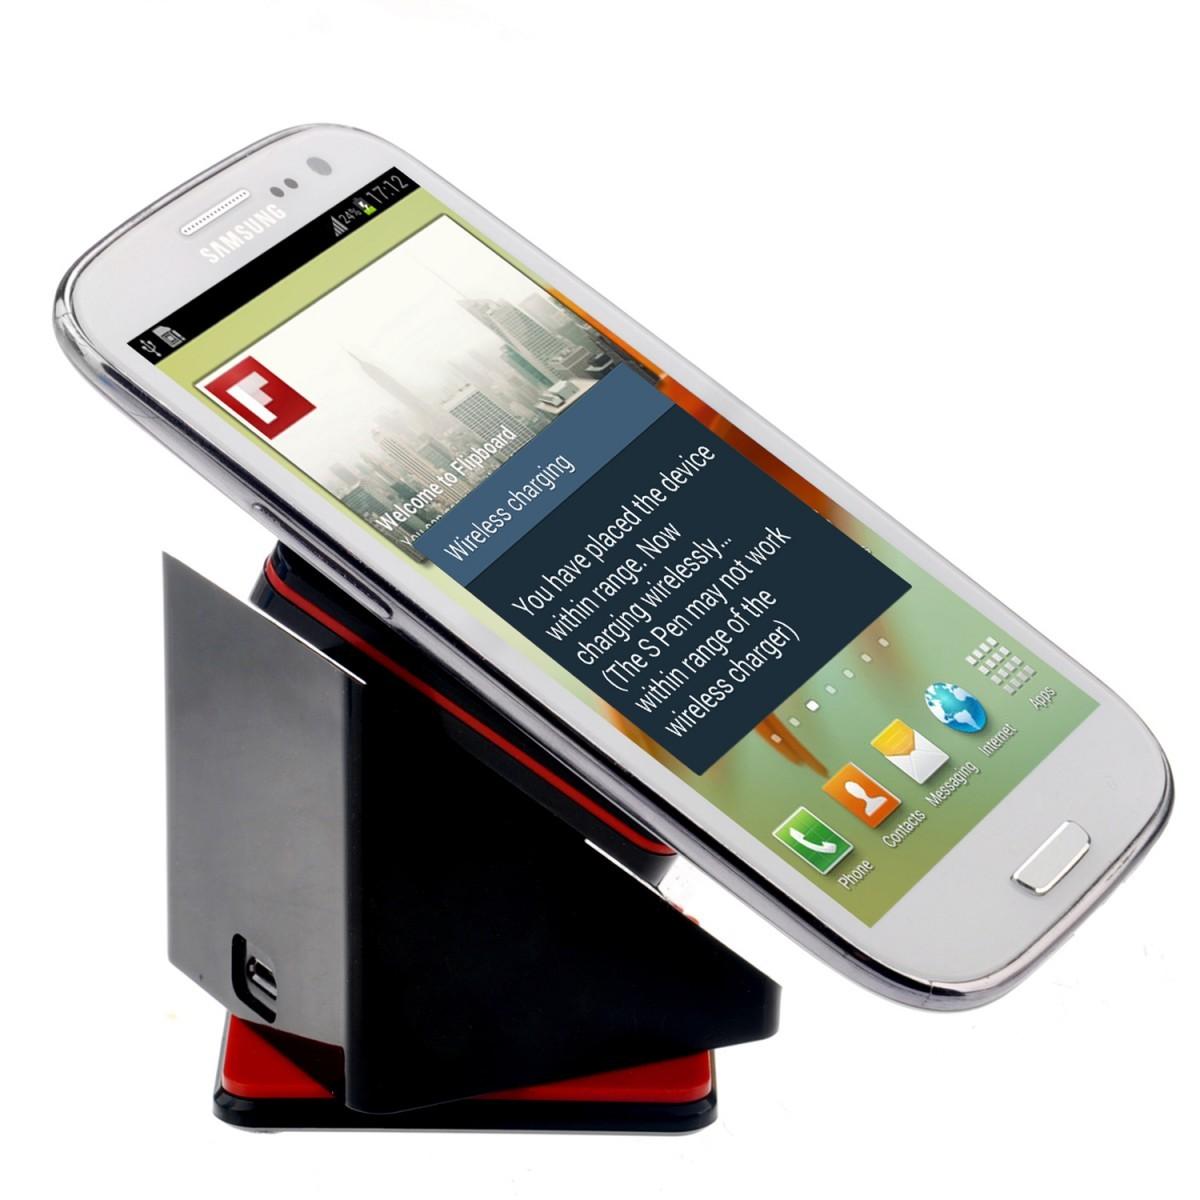 LinkDream Magic Box QI wireless Charger Car Holder for <font><b>Smart</b></font> <font><b>Watch</b></font> Moto360 and Phone Note edge/5/4/3/2 S6/5/4/3 LG G3 Nexus 5/6